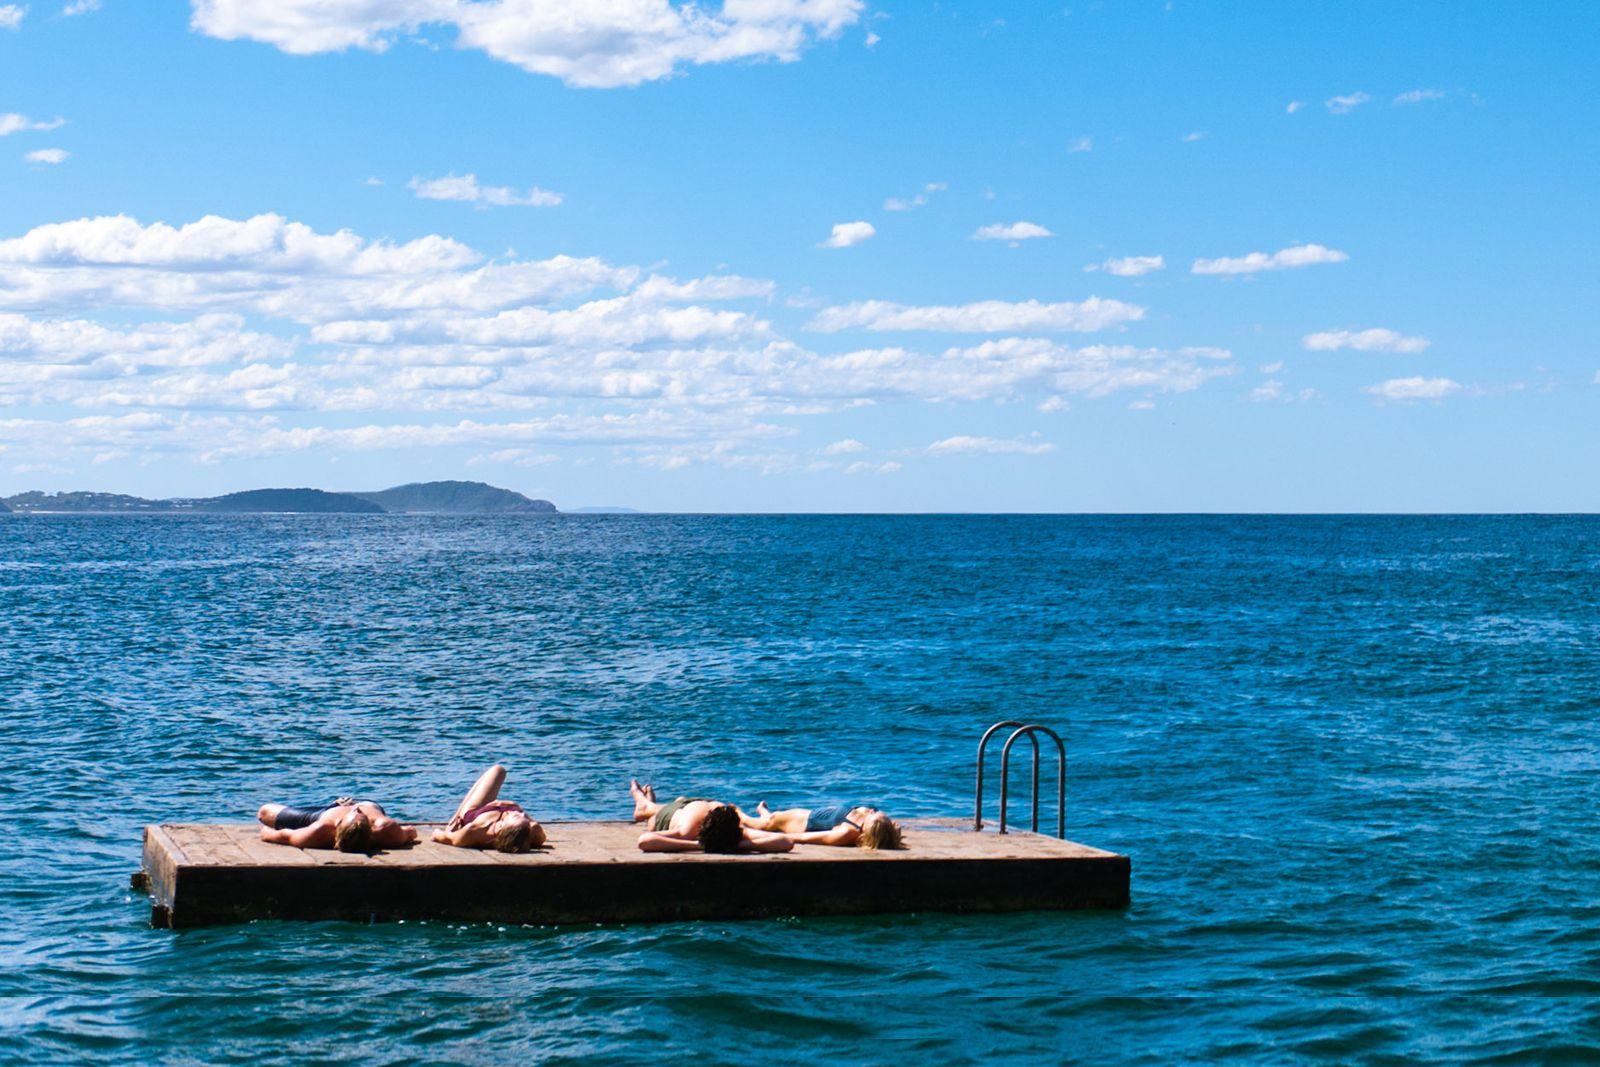 Seal Rocks Australia A Place To Take A Swim In The Ocean